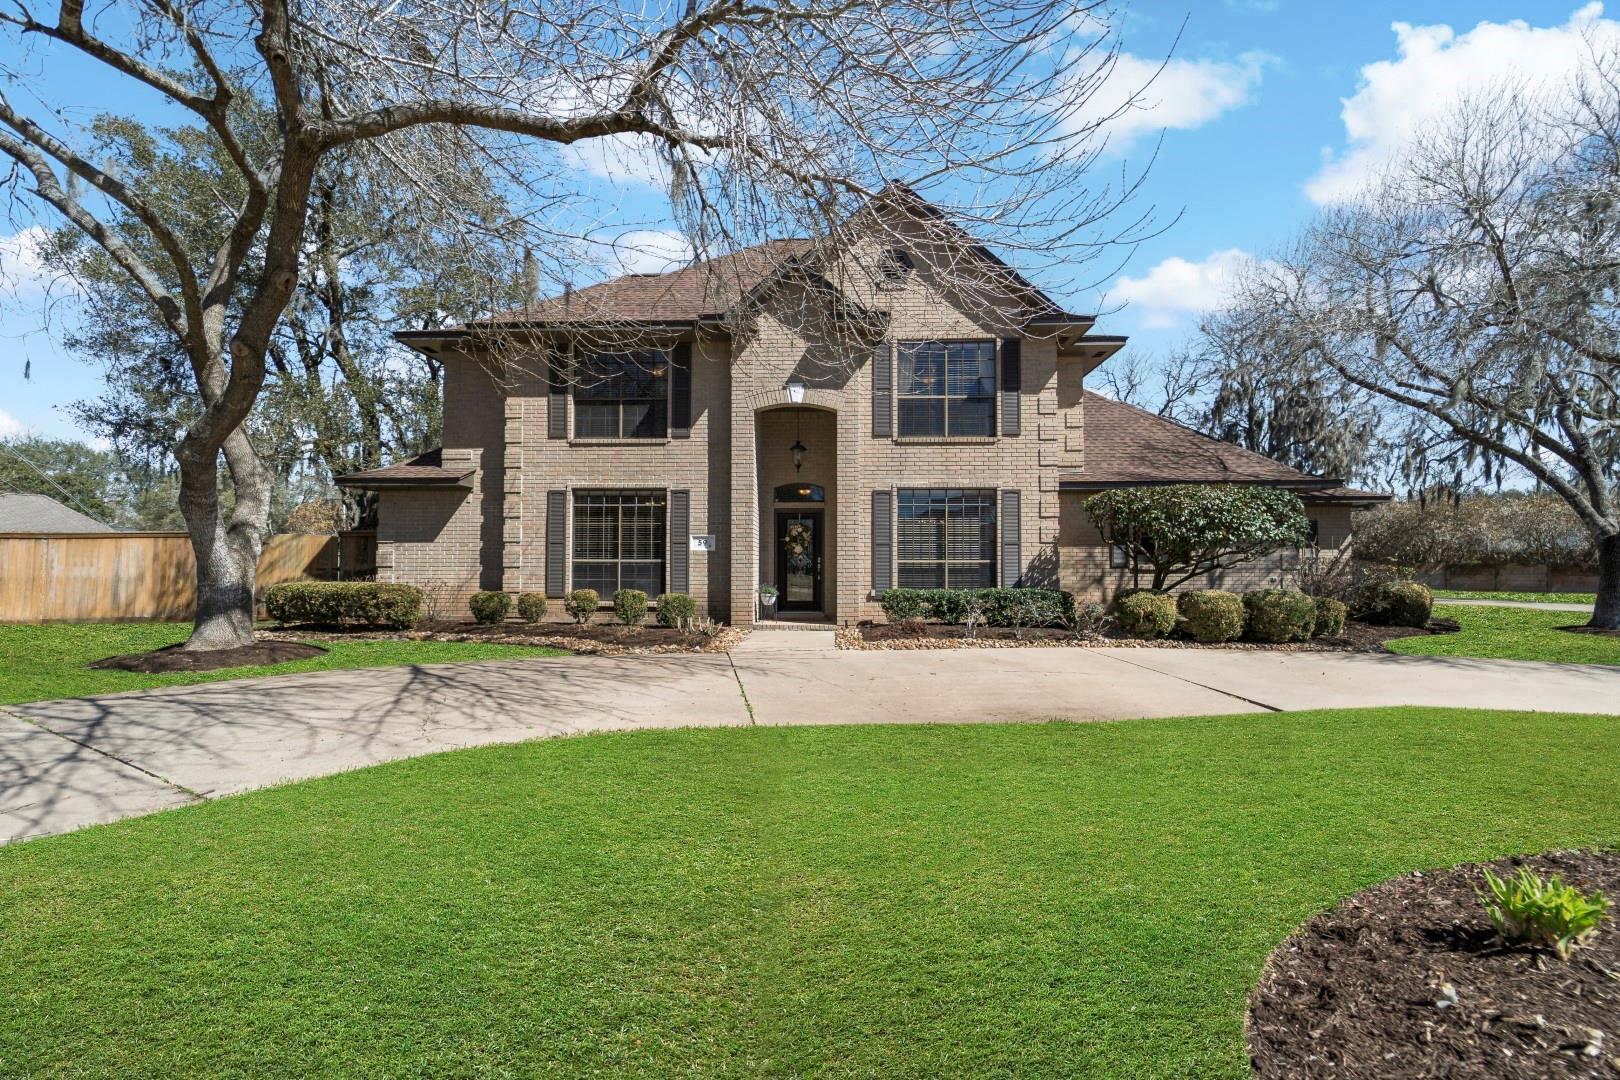 59 Chesswood Court Property Photo - Lake Jackson, TX real estate listing